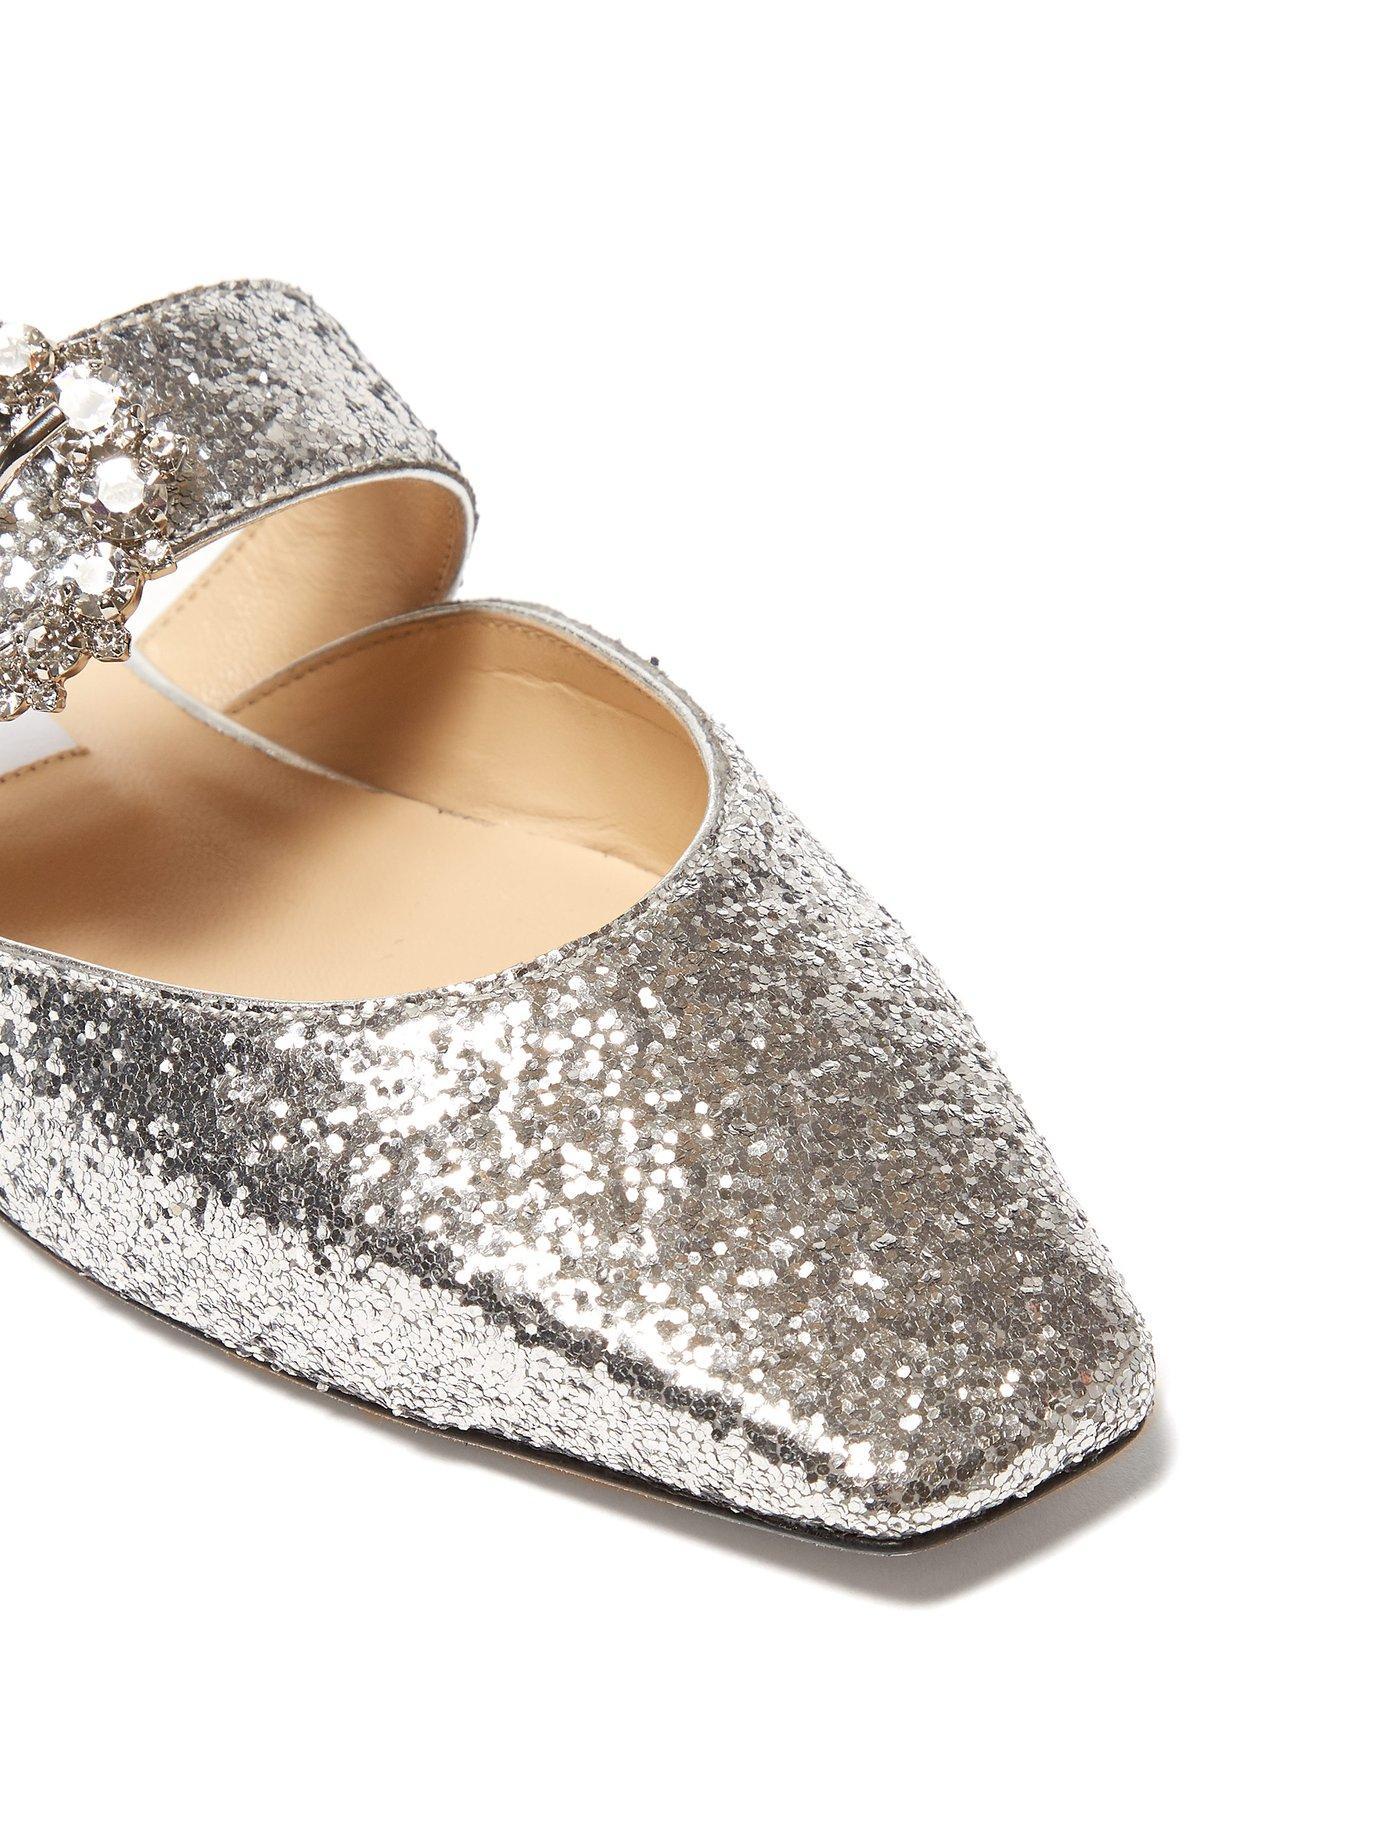 5ffacb7e56ff Jimmy Choo. Women s Metallic Gee Crystal Buckle Glittered Backless Flats